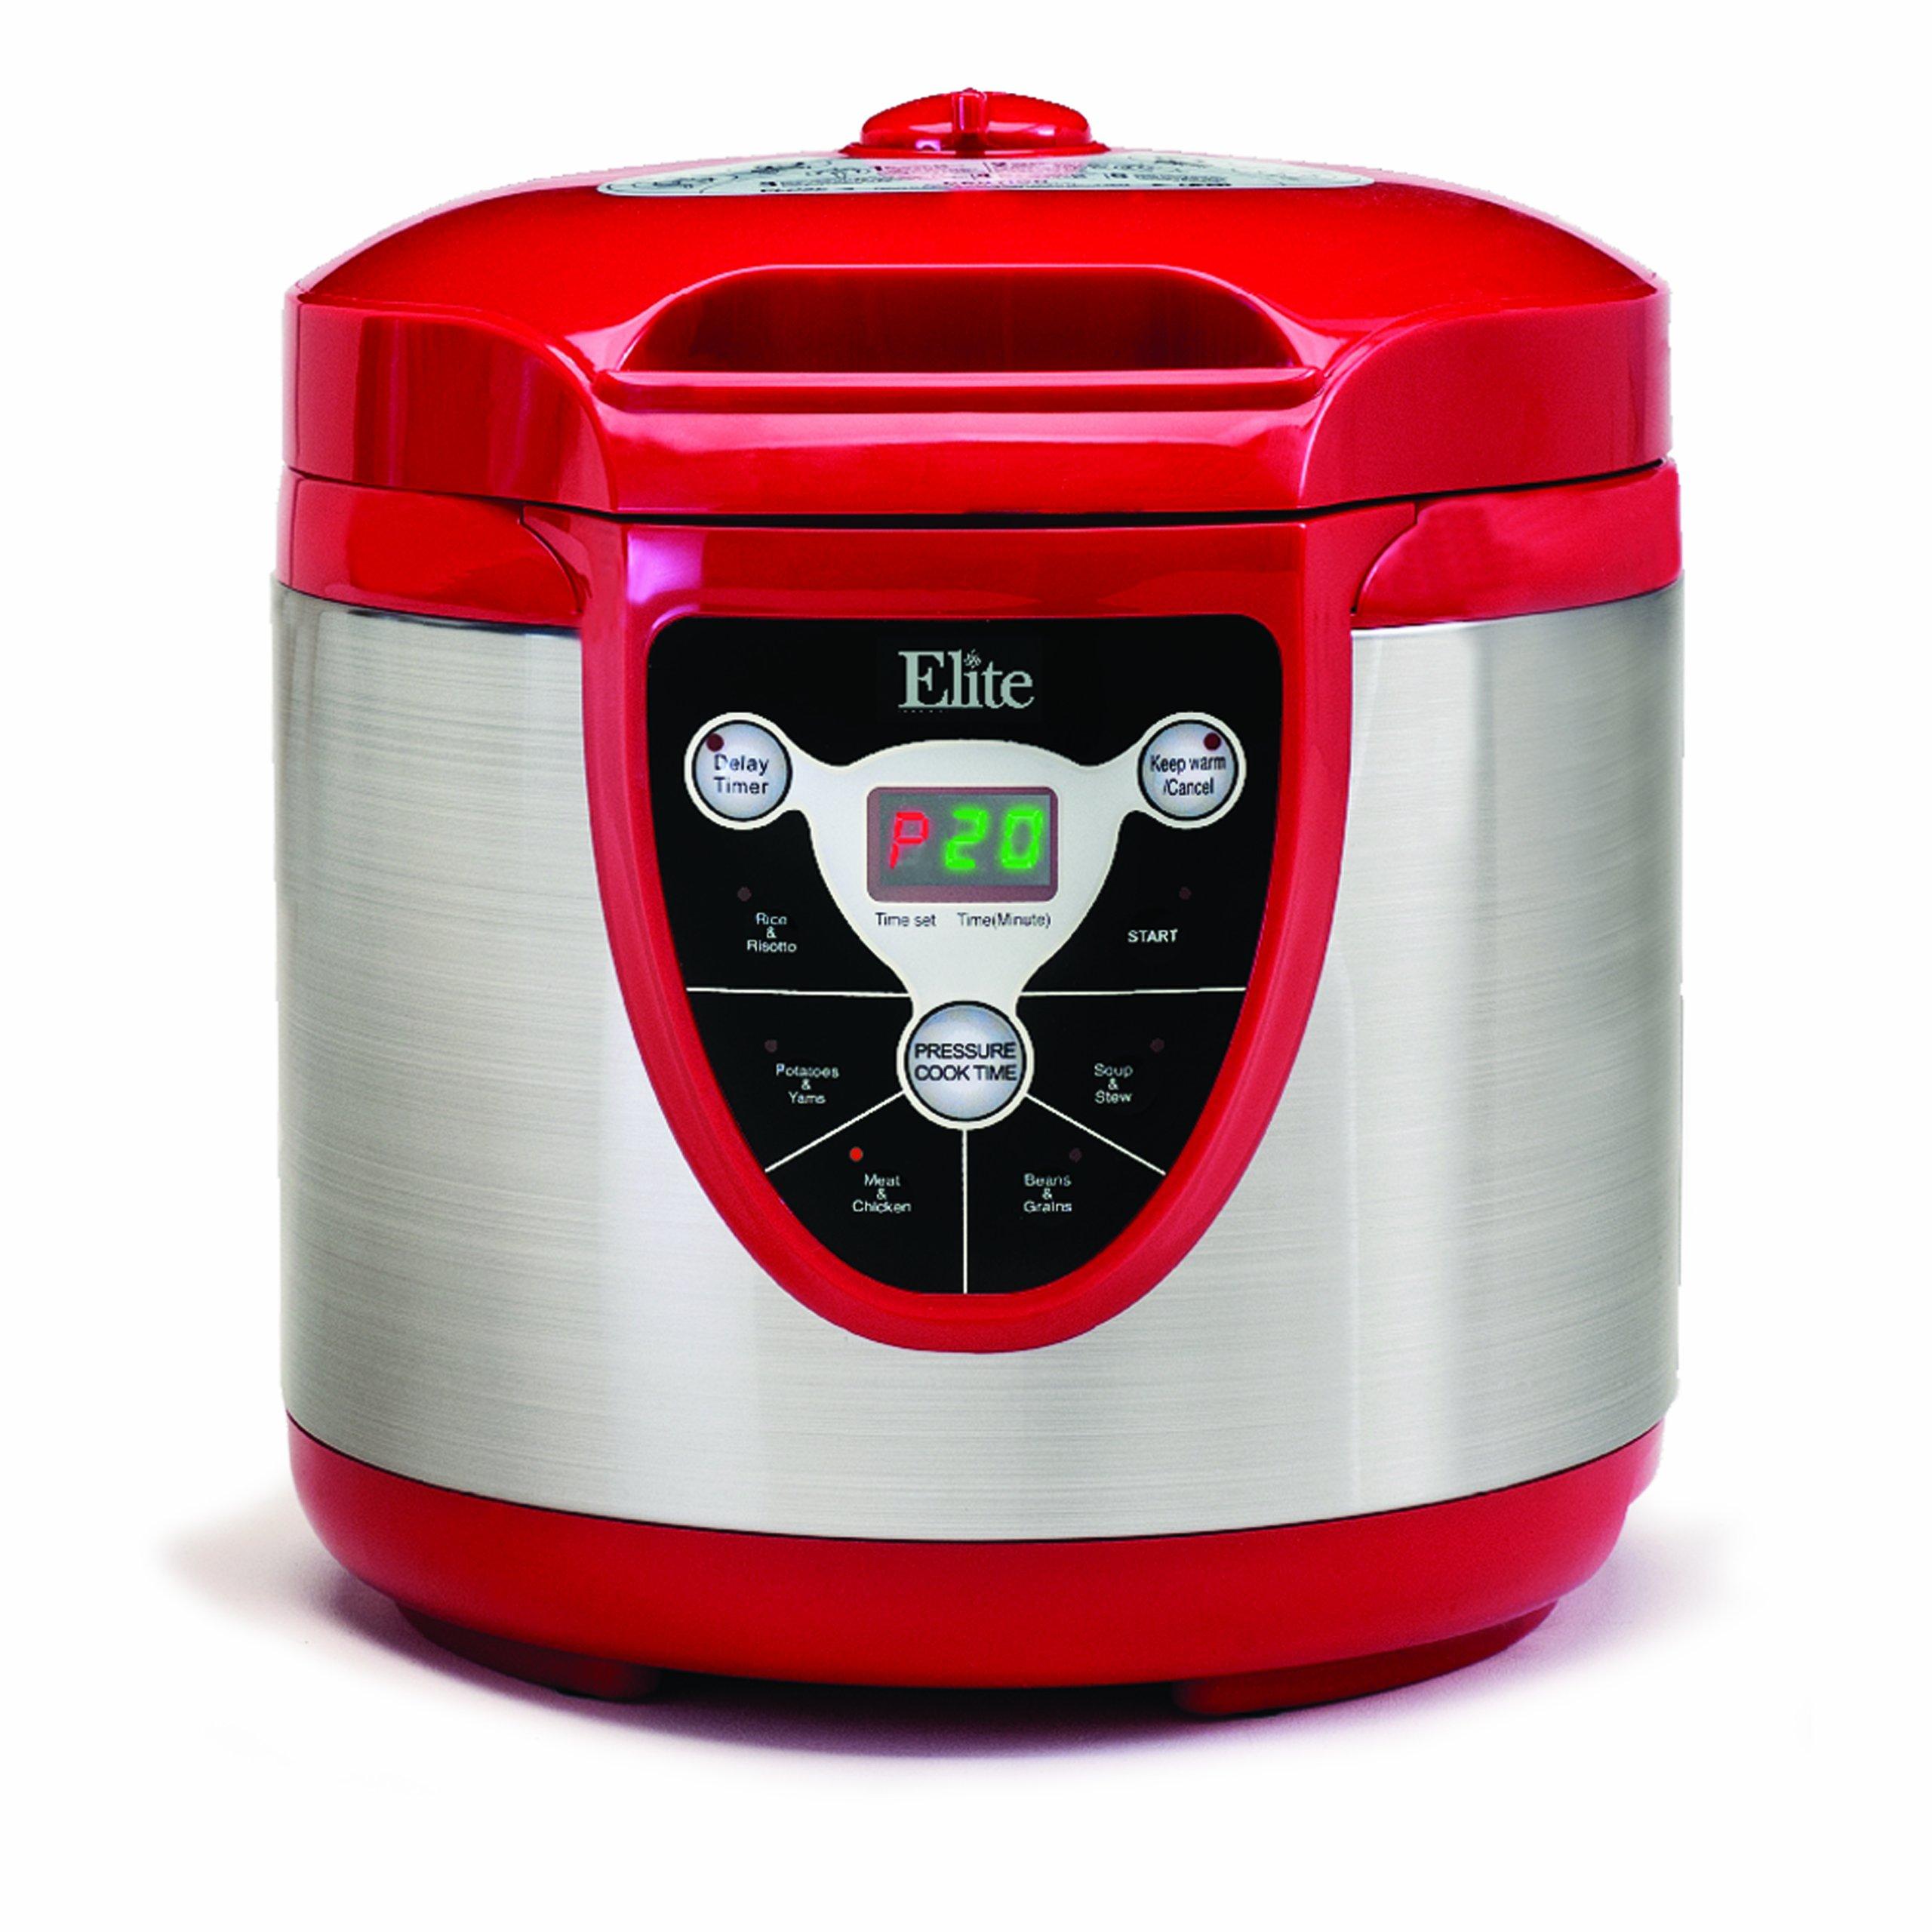 Elite Platinum EPC-607R Maxi-Matic 6 Quart Electric Pressure Cooker, Red (Stainless Steel)